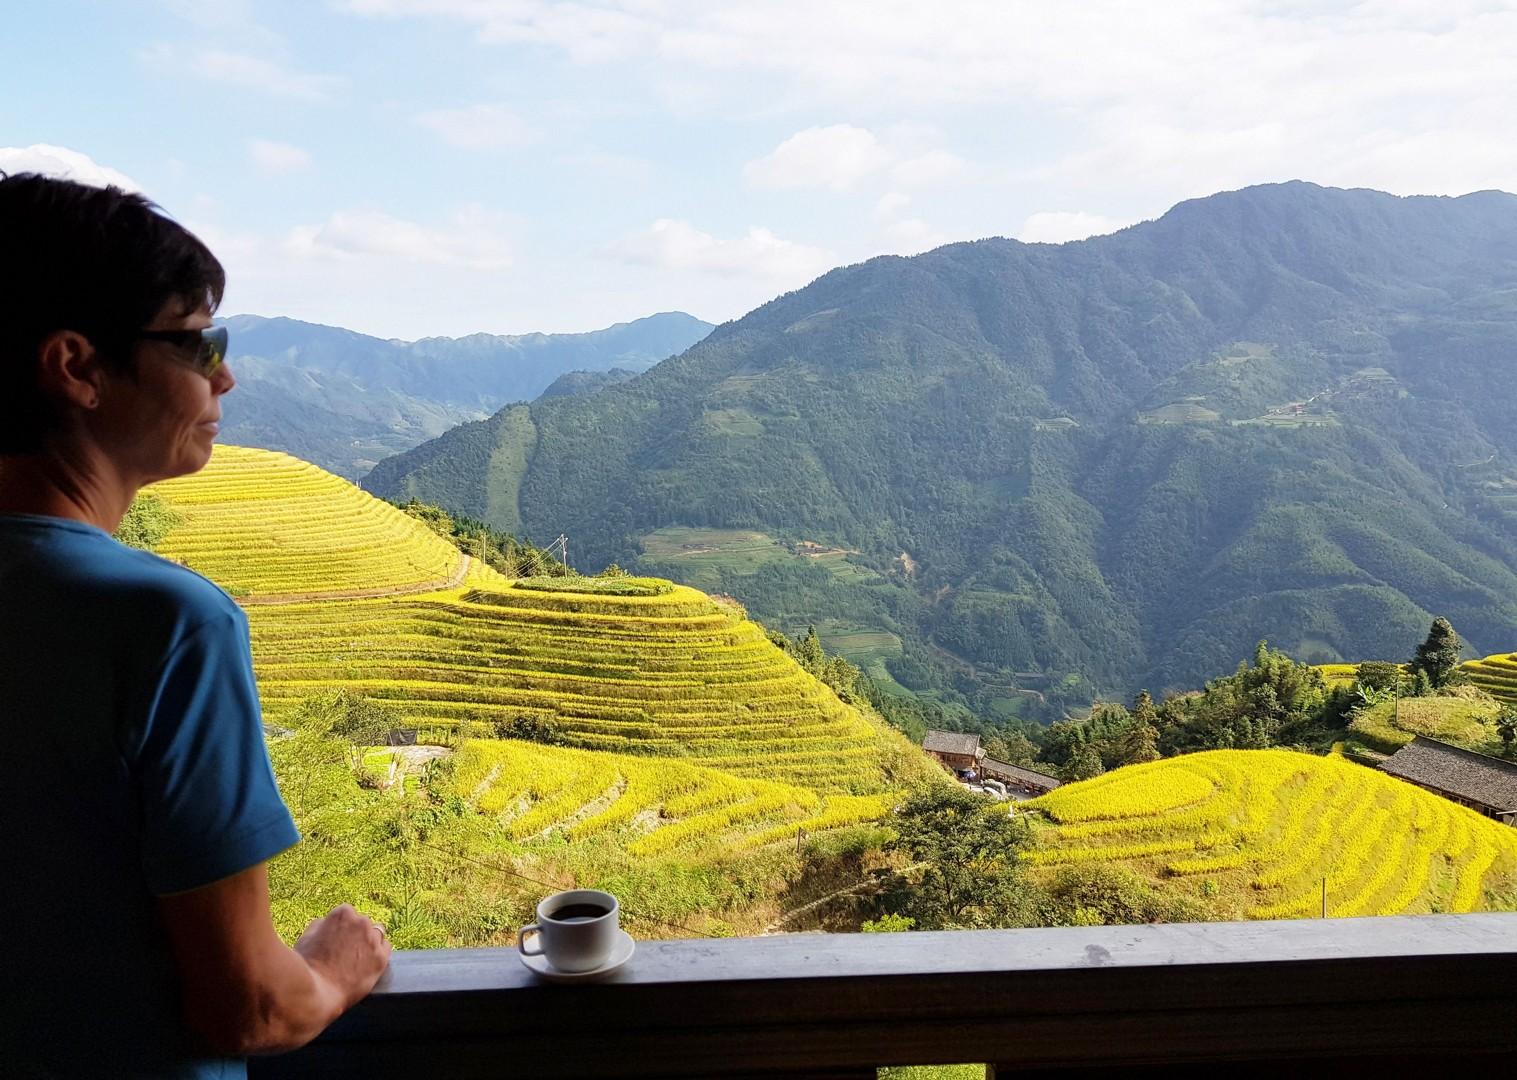 20171013_151503.jpg - China - Guilin and Guangxi - Cycling Adventures